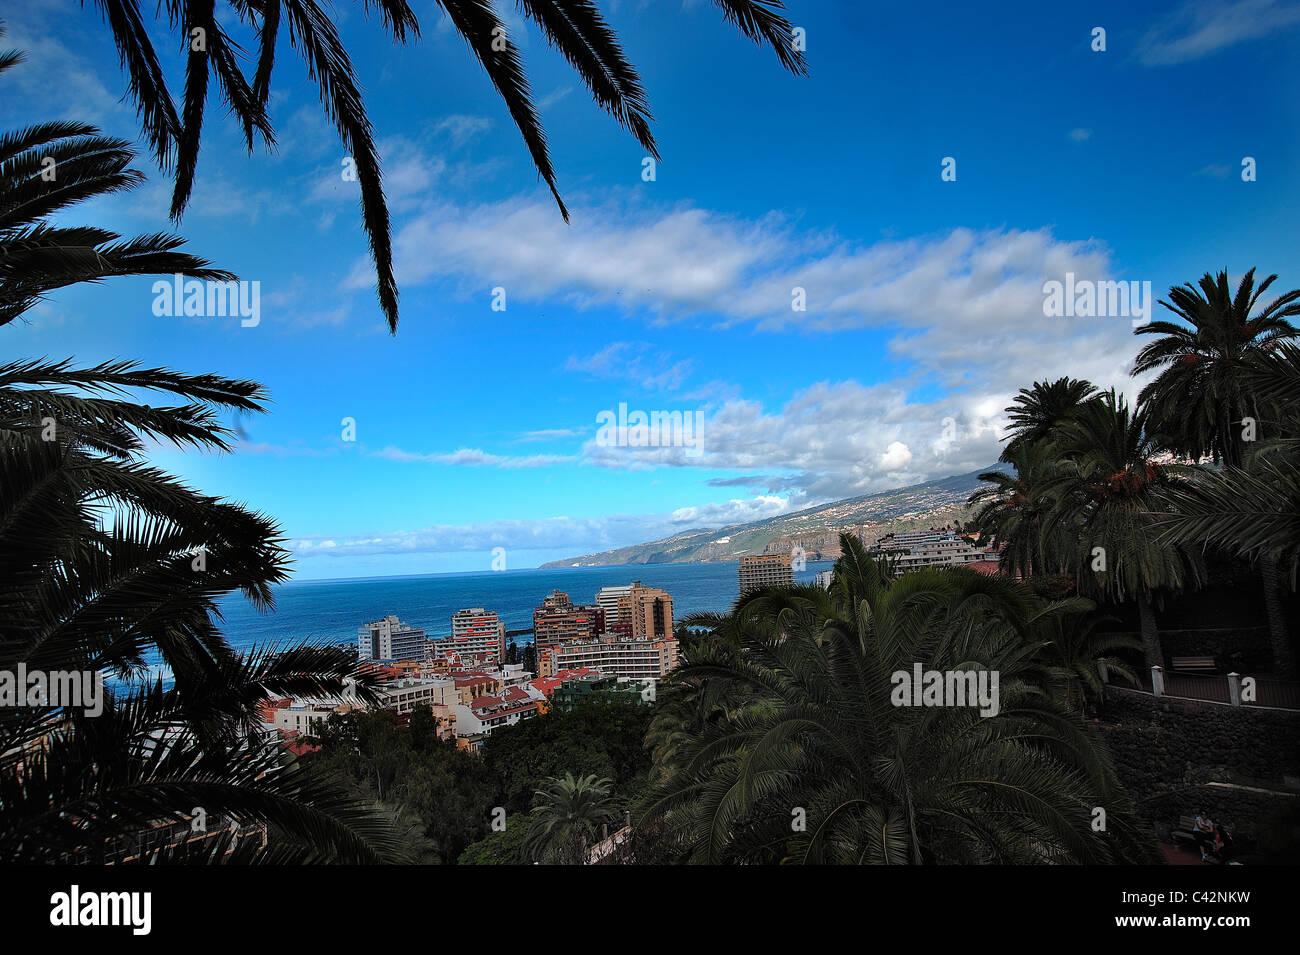 Puerto de la Cruz, Tenerife, The Canary Islands - Stock Image